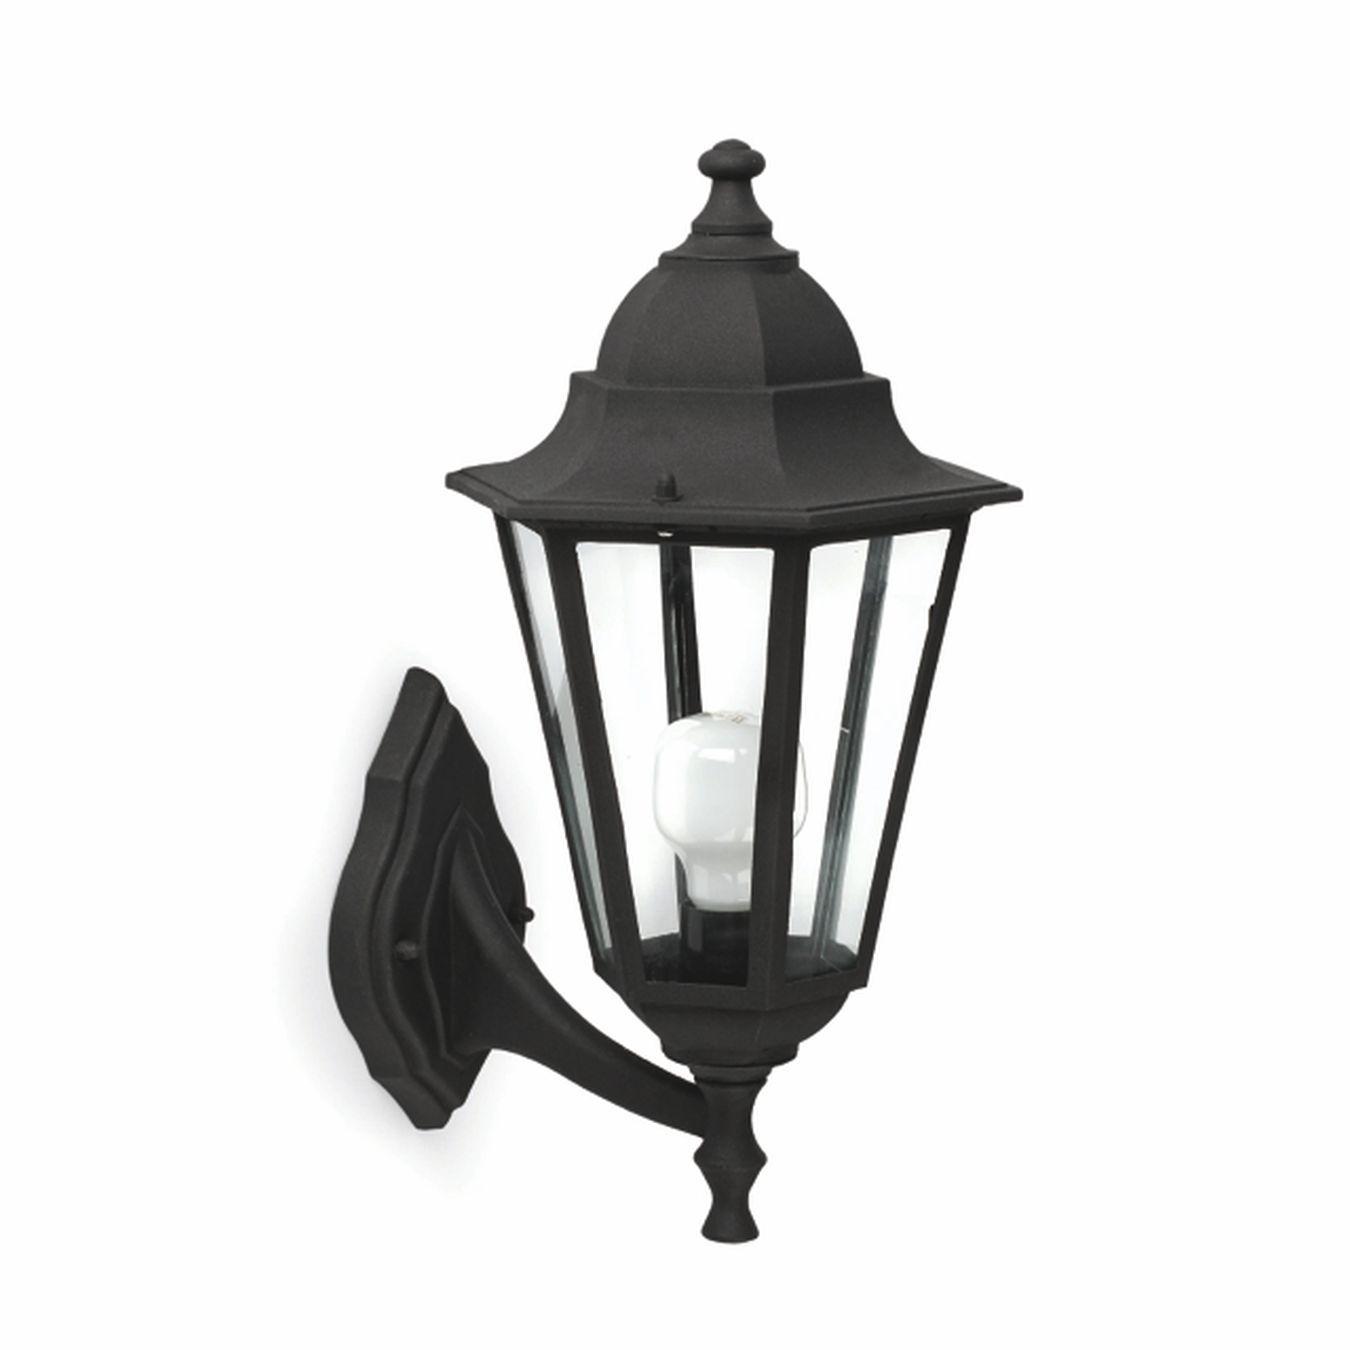 lmpara aplique de pared clsica jardn jardin clasica iluminacion lamparas